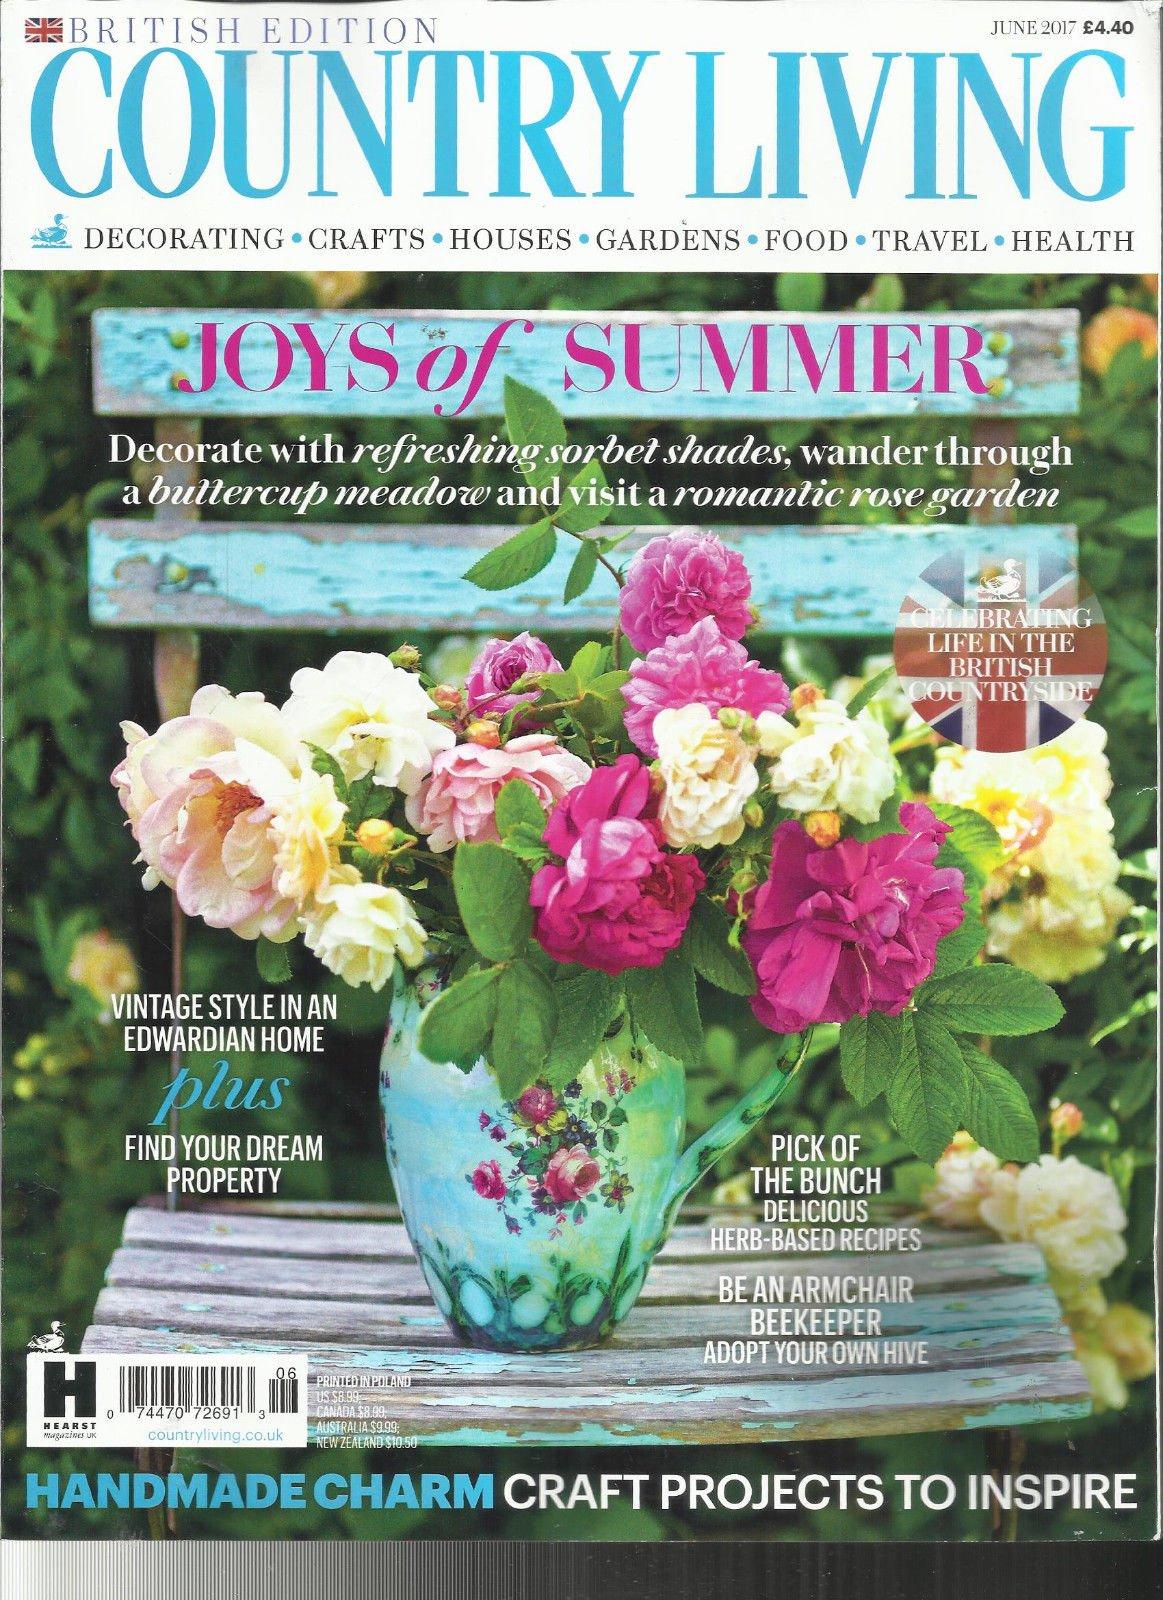 COUNTRY LIVING MAGAZINE, JUNE, 2017 BRITISH EDITION JOYS OF SUMMER